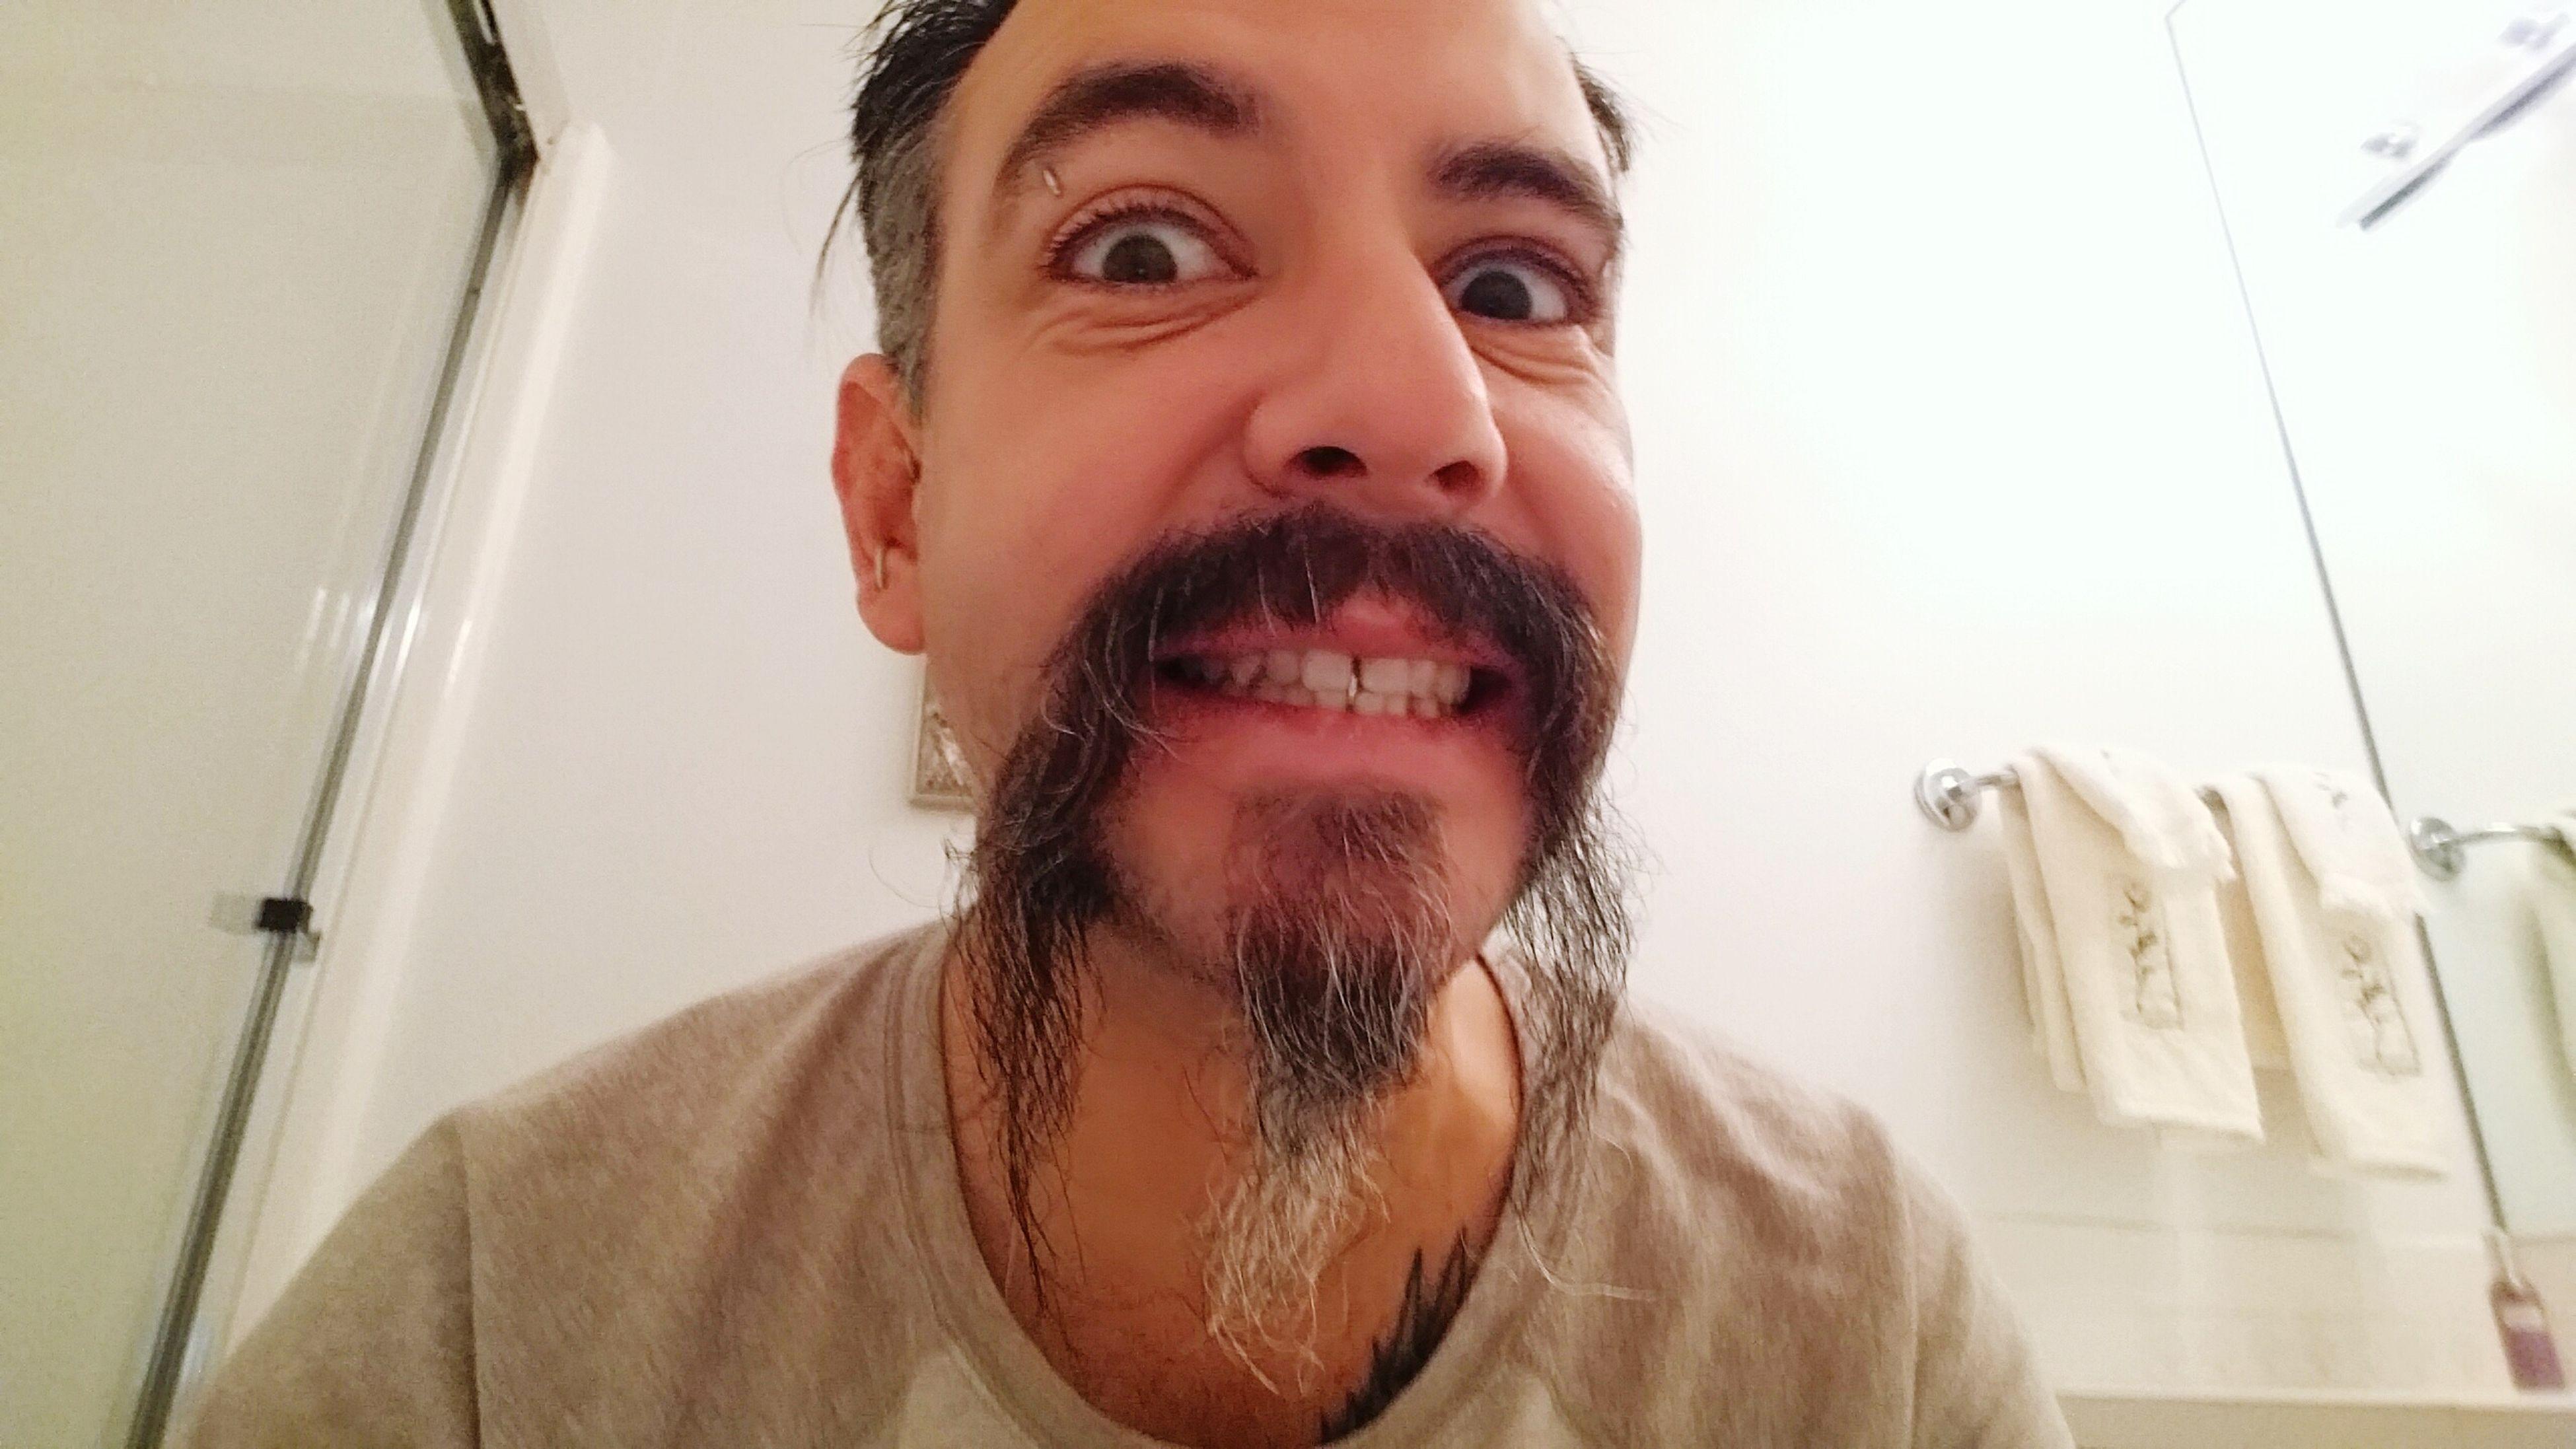 My Mo For Movember Fu Manchu Nu Manchu Mustache Power Mustache The Vandals Bathroom Selfie